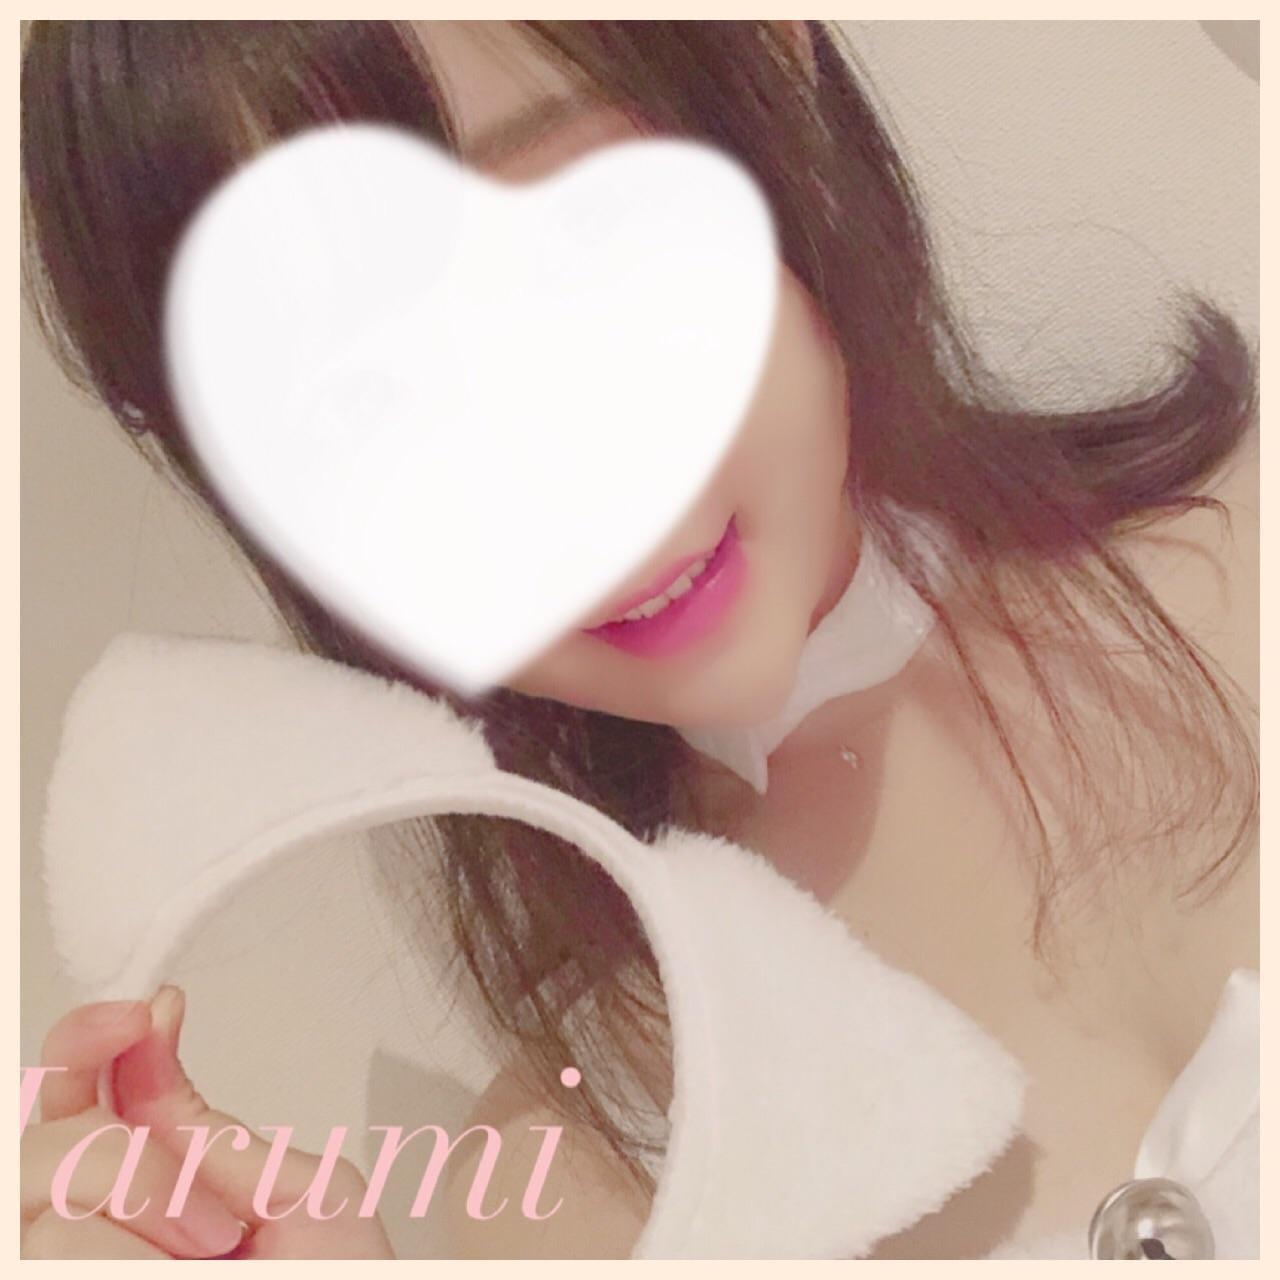 「K様へ」10/16(火) 01:50   はるみの写メ・風俗動画